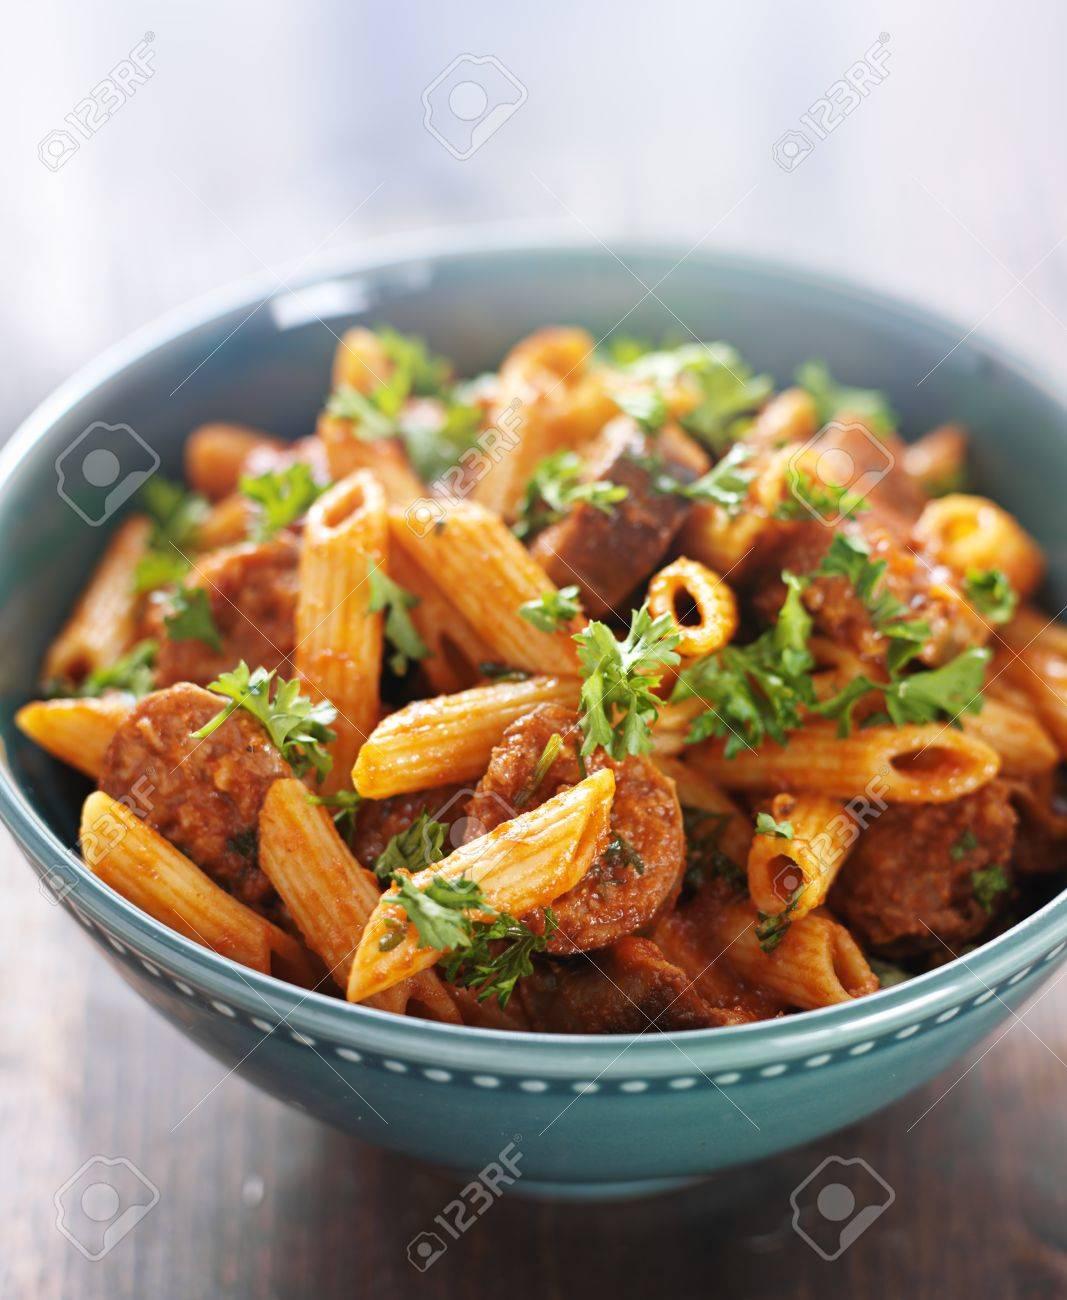 bowl of rigatoni pasta with sausage Stock Photo - 21585424